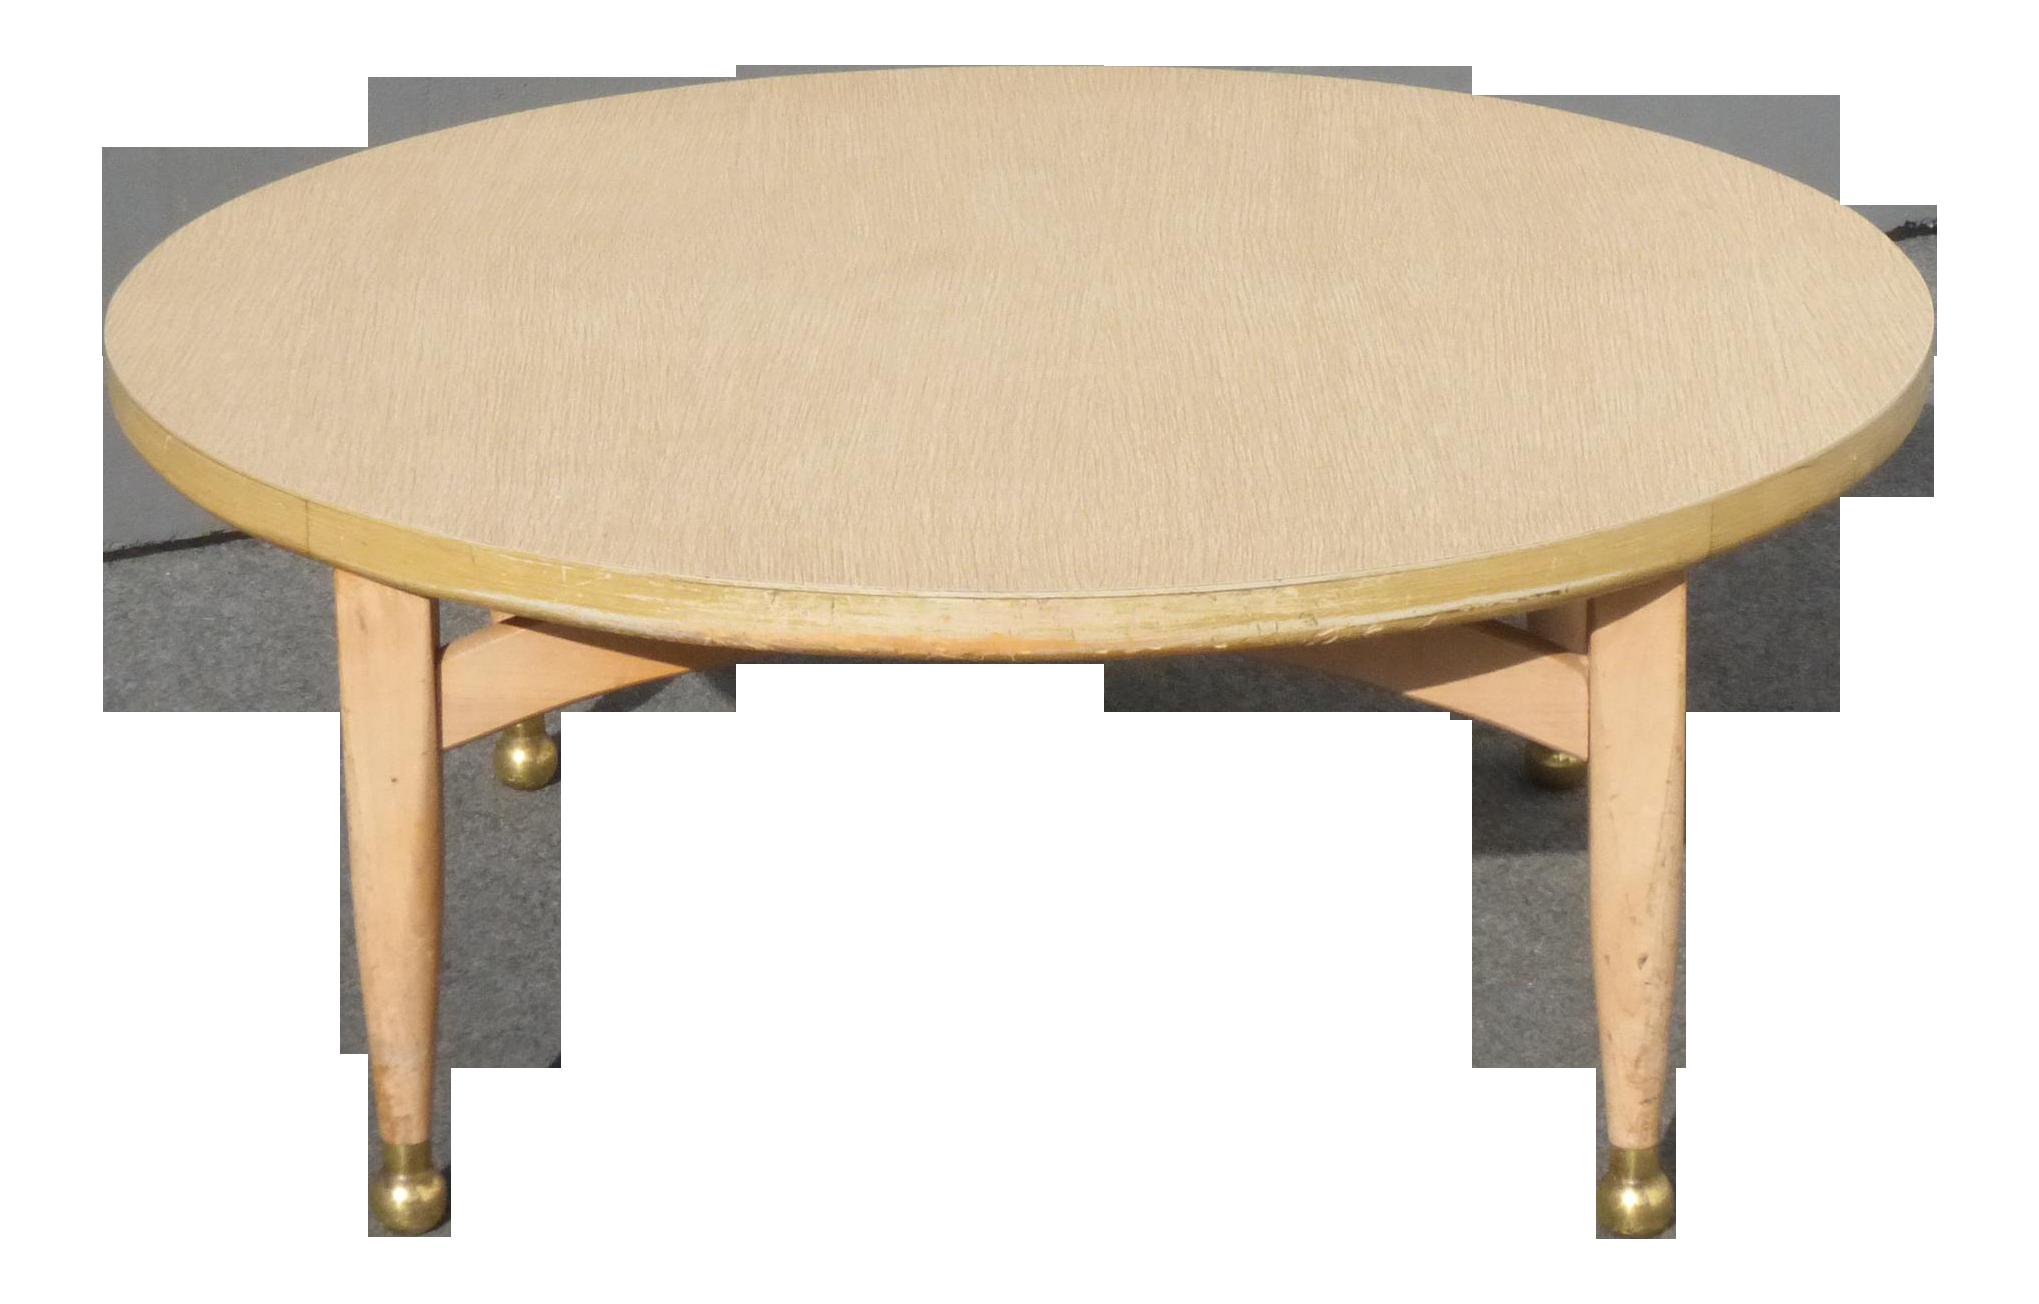 Vintage Danish Mid Century Modern Style Round Coffee Table Peg Leg Gold Feet Coffee Table Round Coffee Table Mid Century Modern Style [ 1304 x 2039 Pixel ]